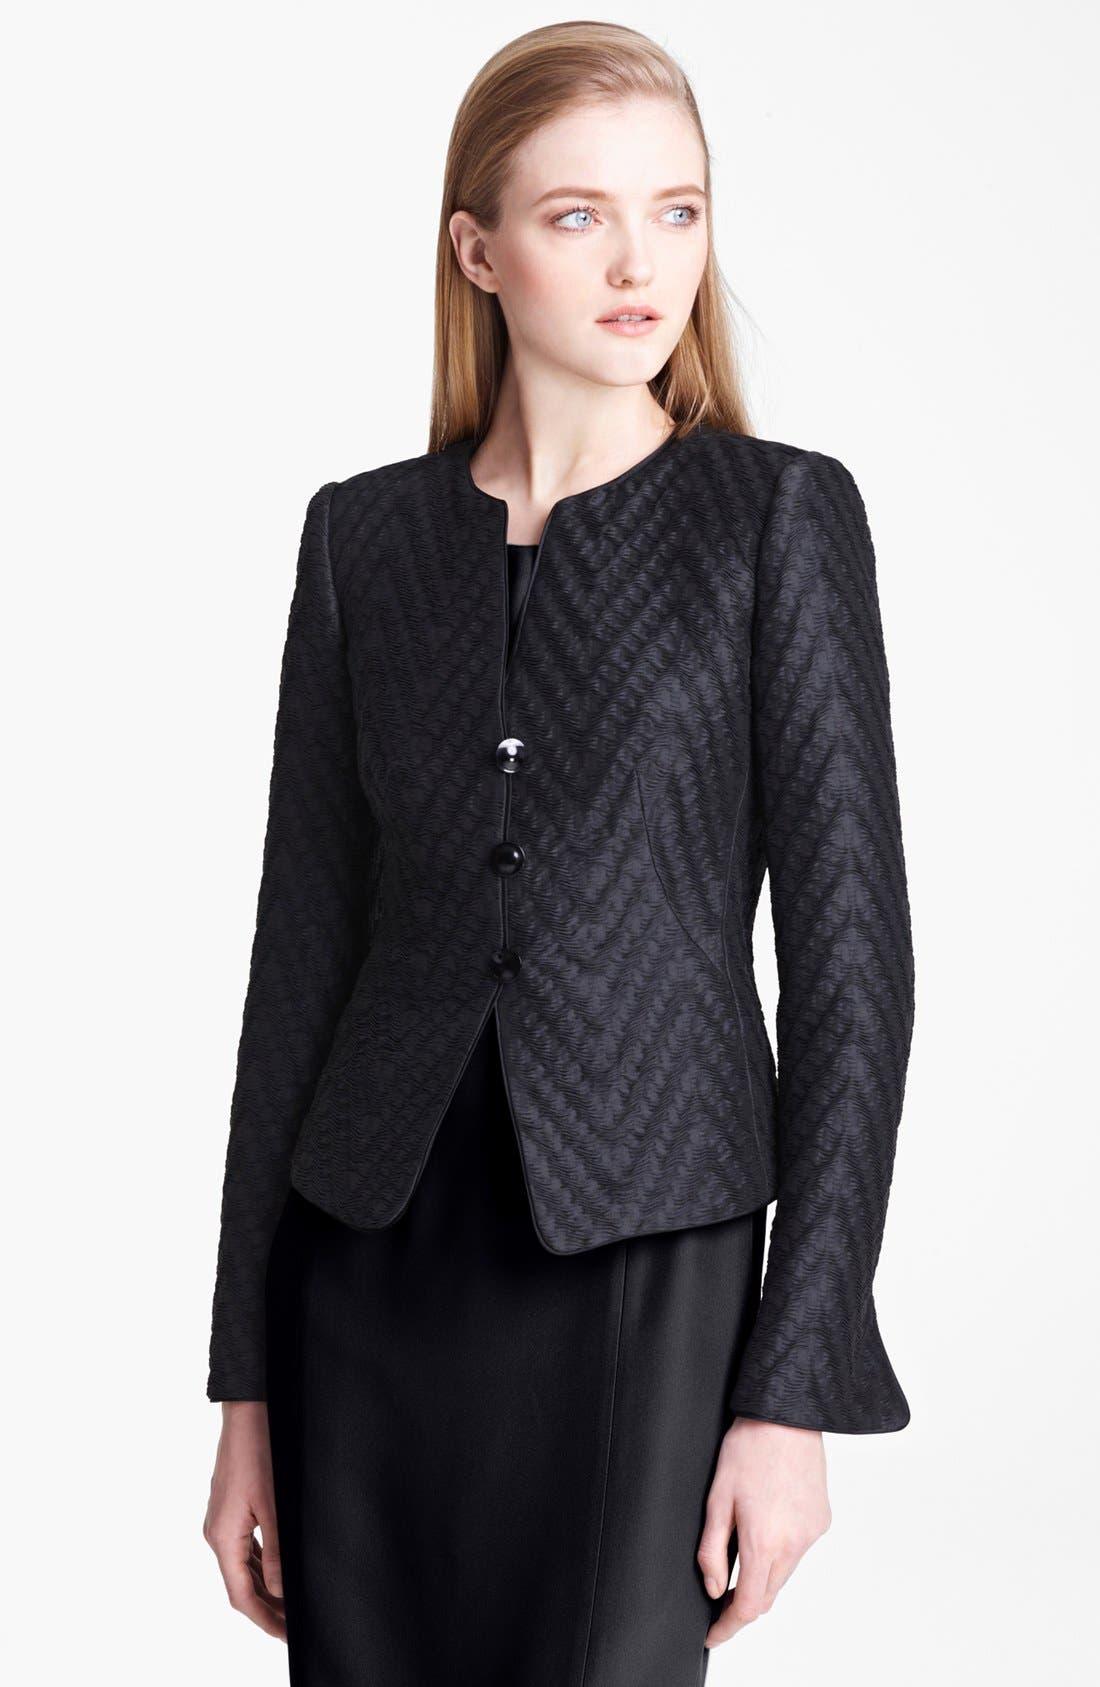 Main Image - Armani Collezioni Wave Jacquard Jacket